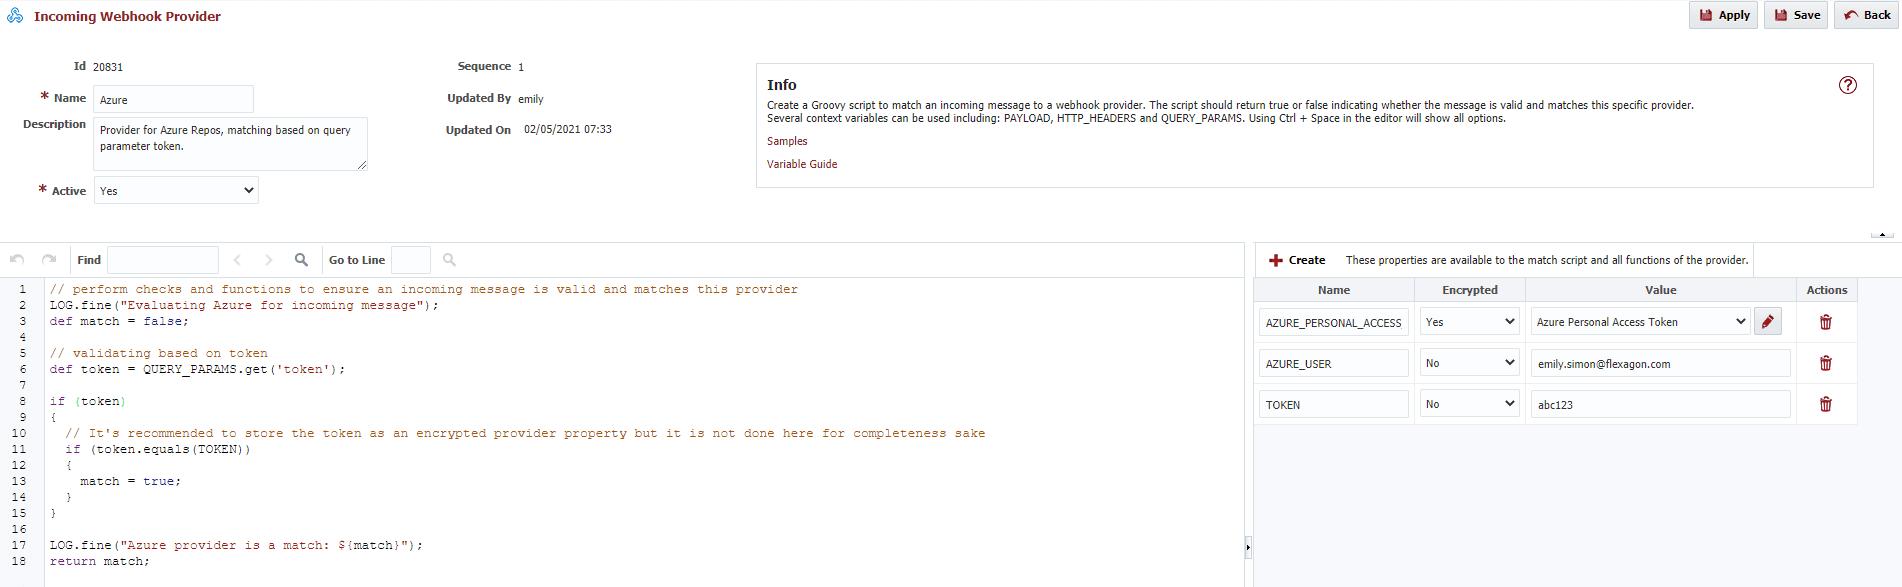 Incoming Webhook Provider Window